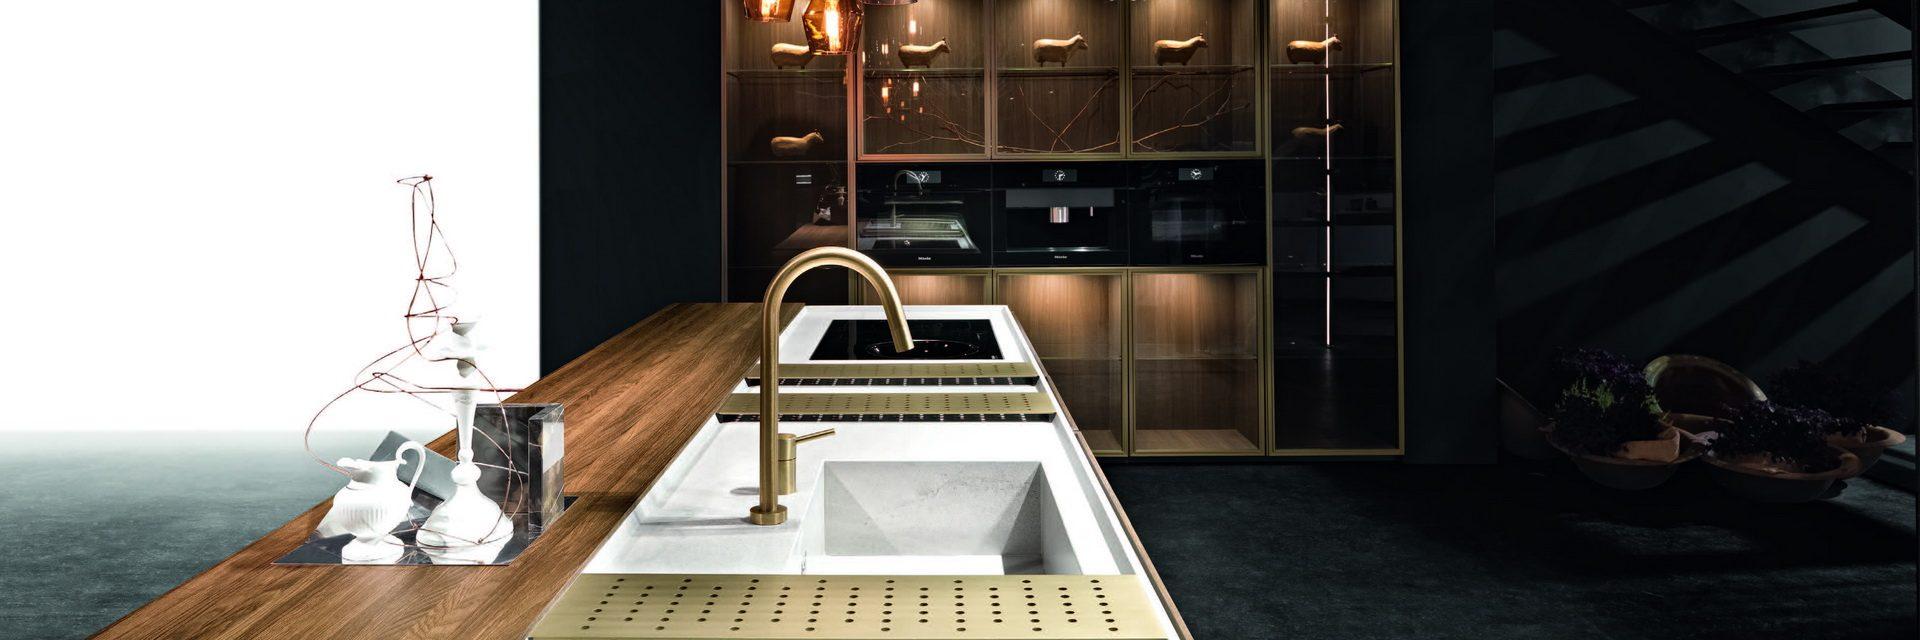 cucine moderne - design binovamilano.it